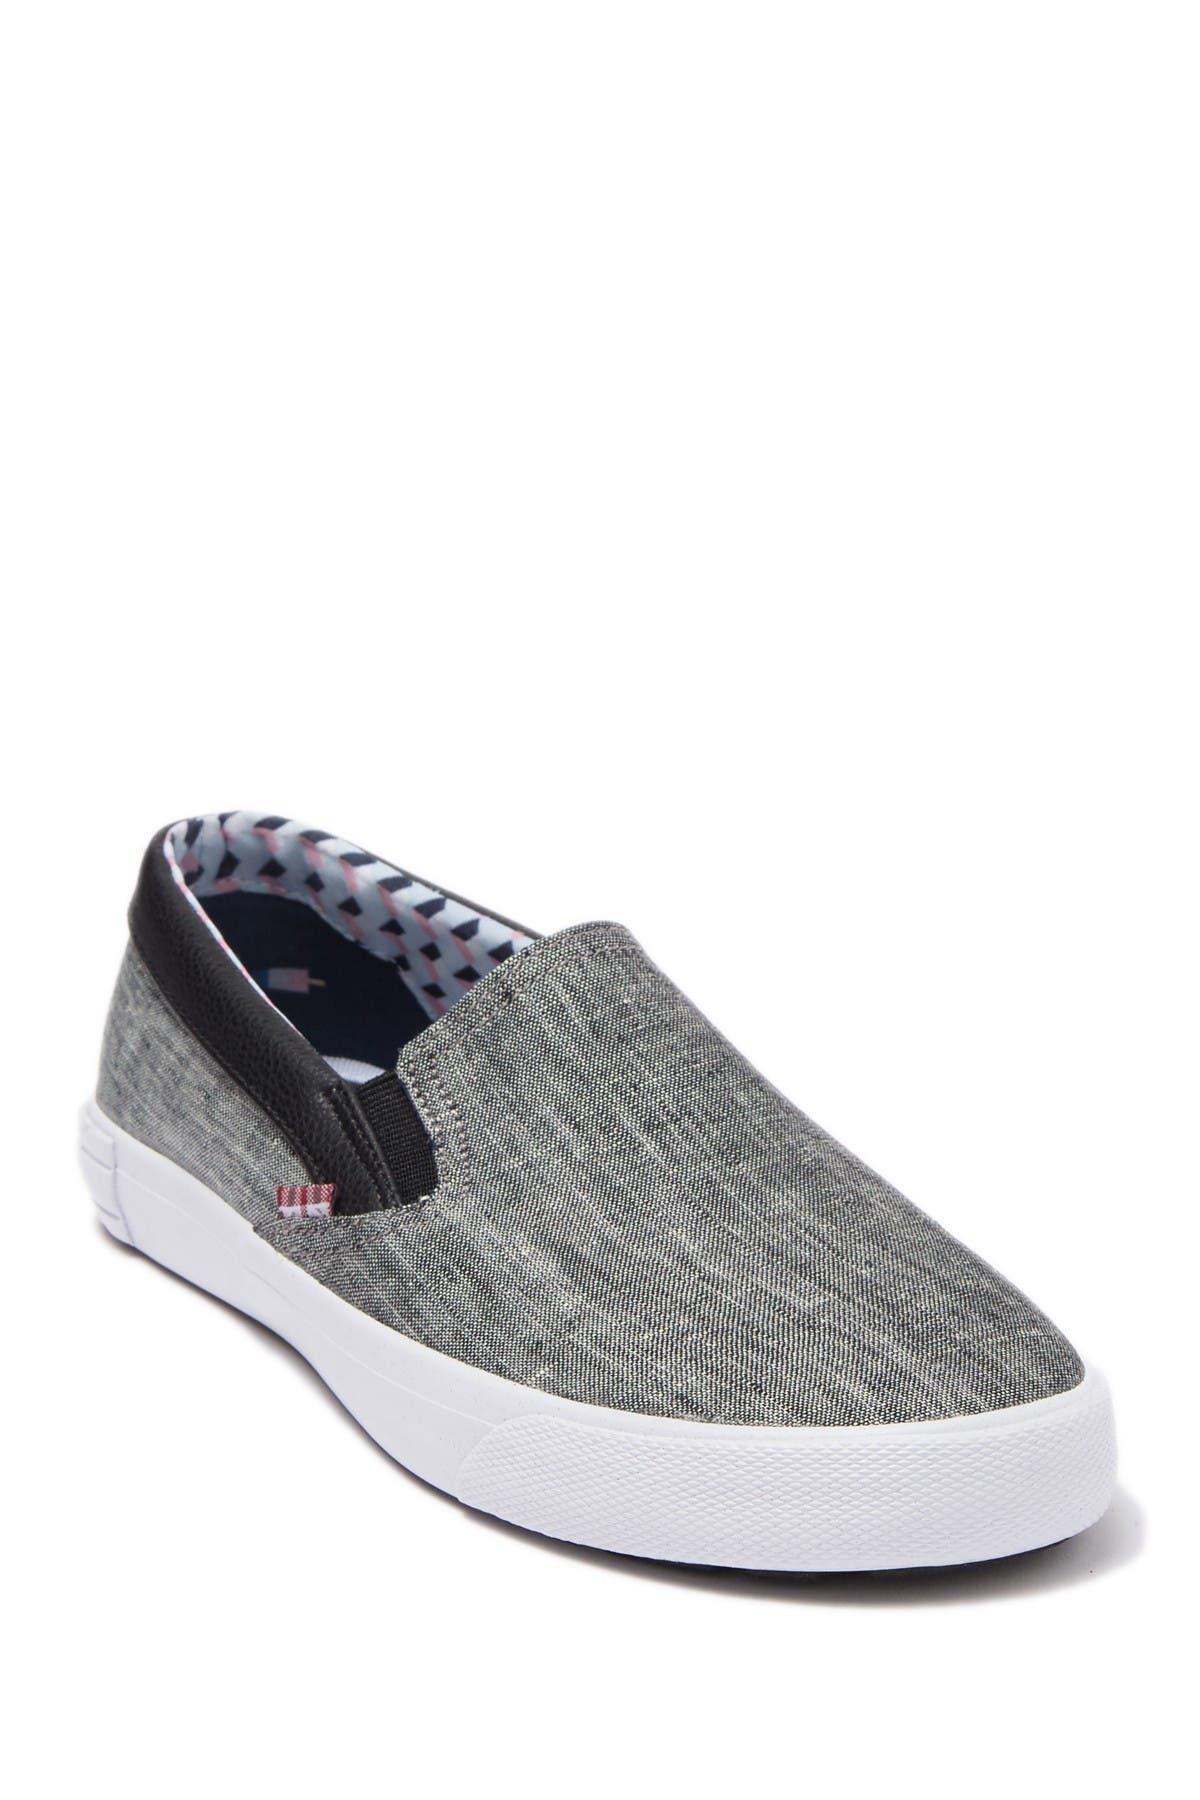 Image of Ben Sherman Percy Slip-On Sneaker